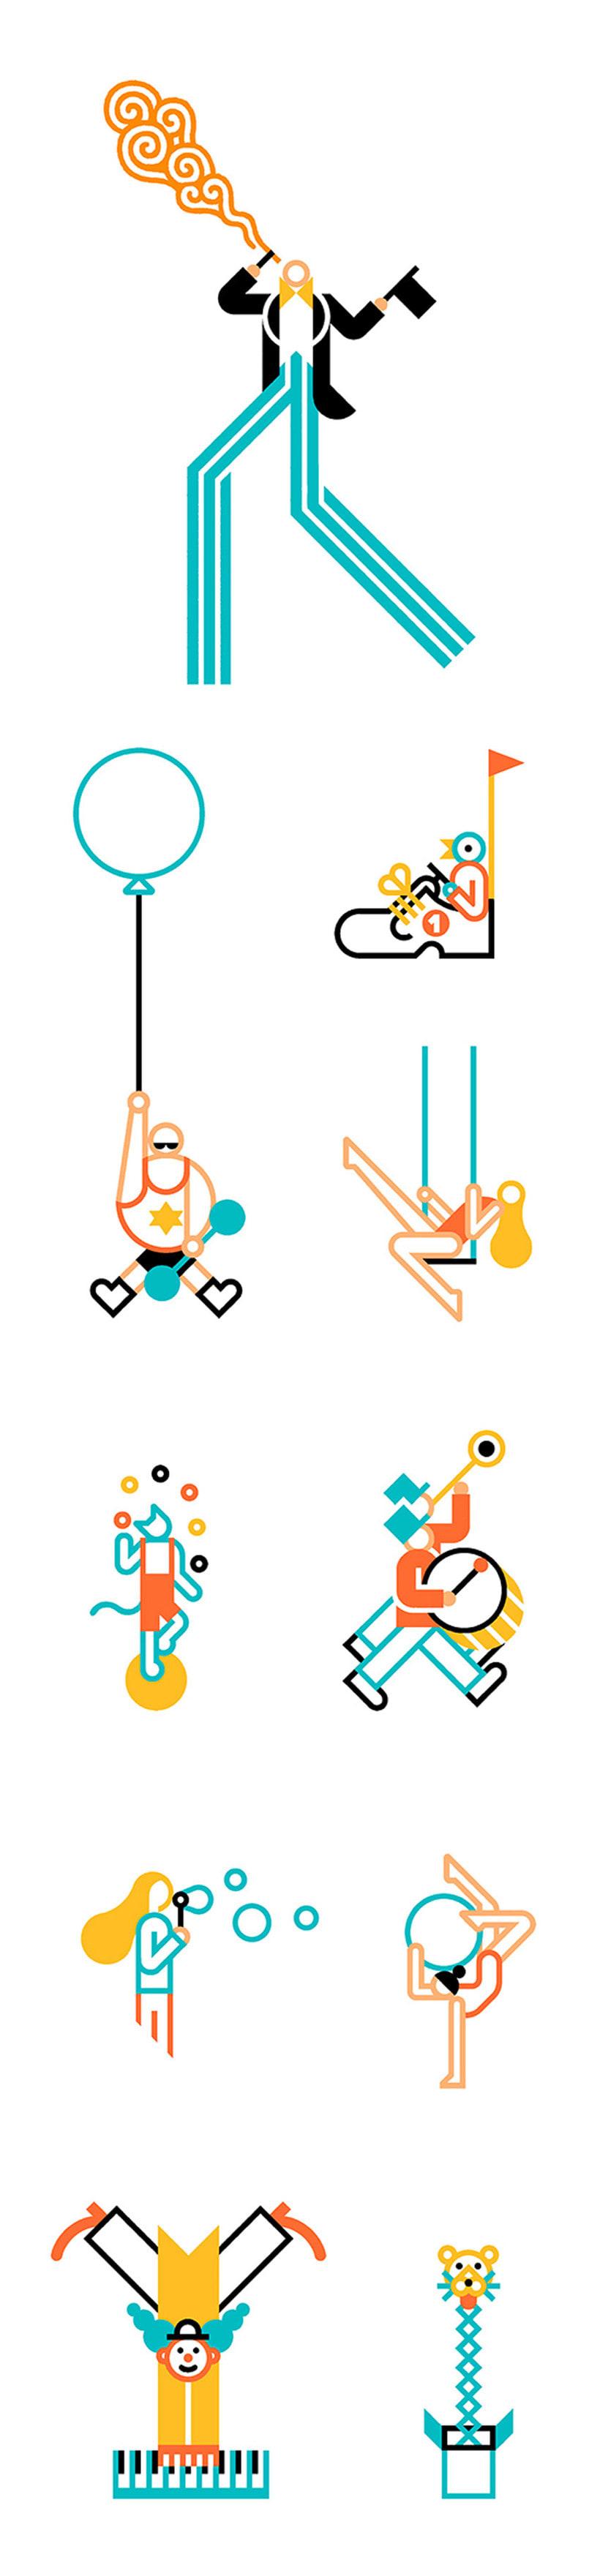 Carlos Arrojo: ilustrando con líneas 13